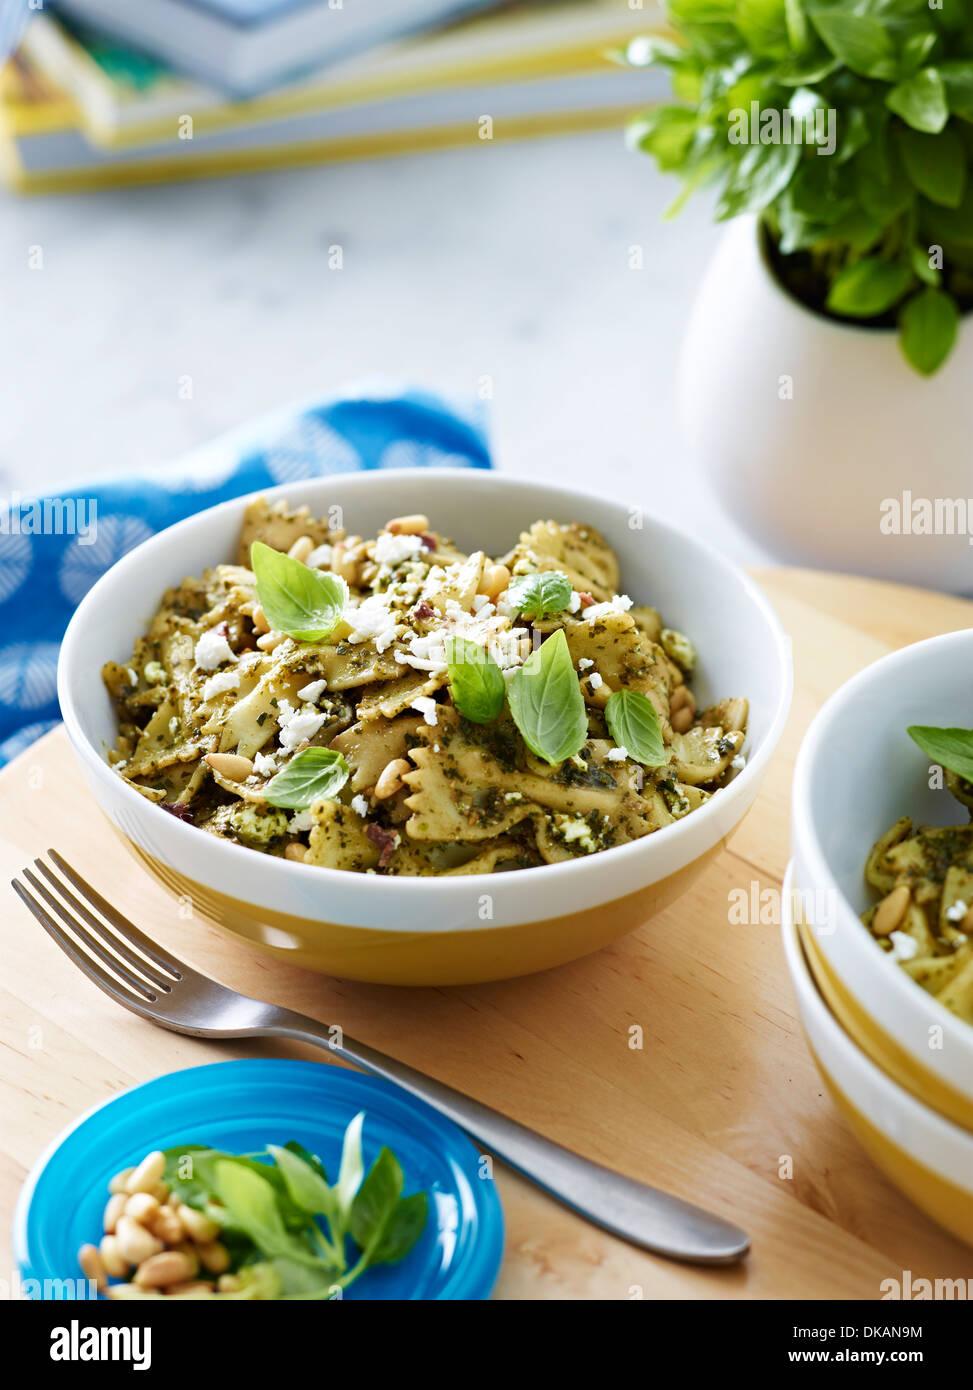 Bowl of farfalle pasta with herb garnish - Stock Image